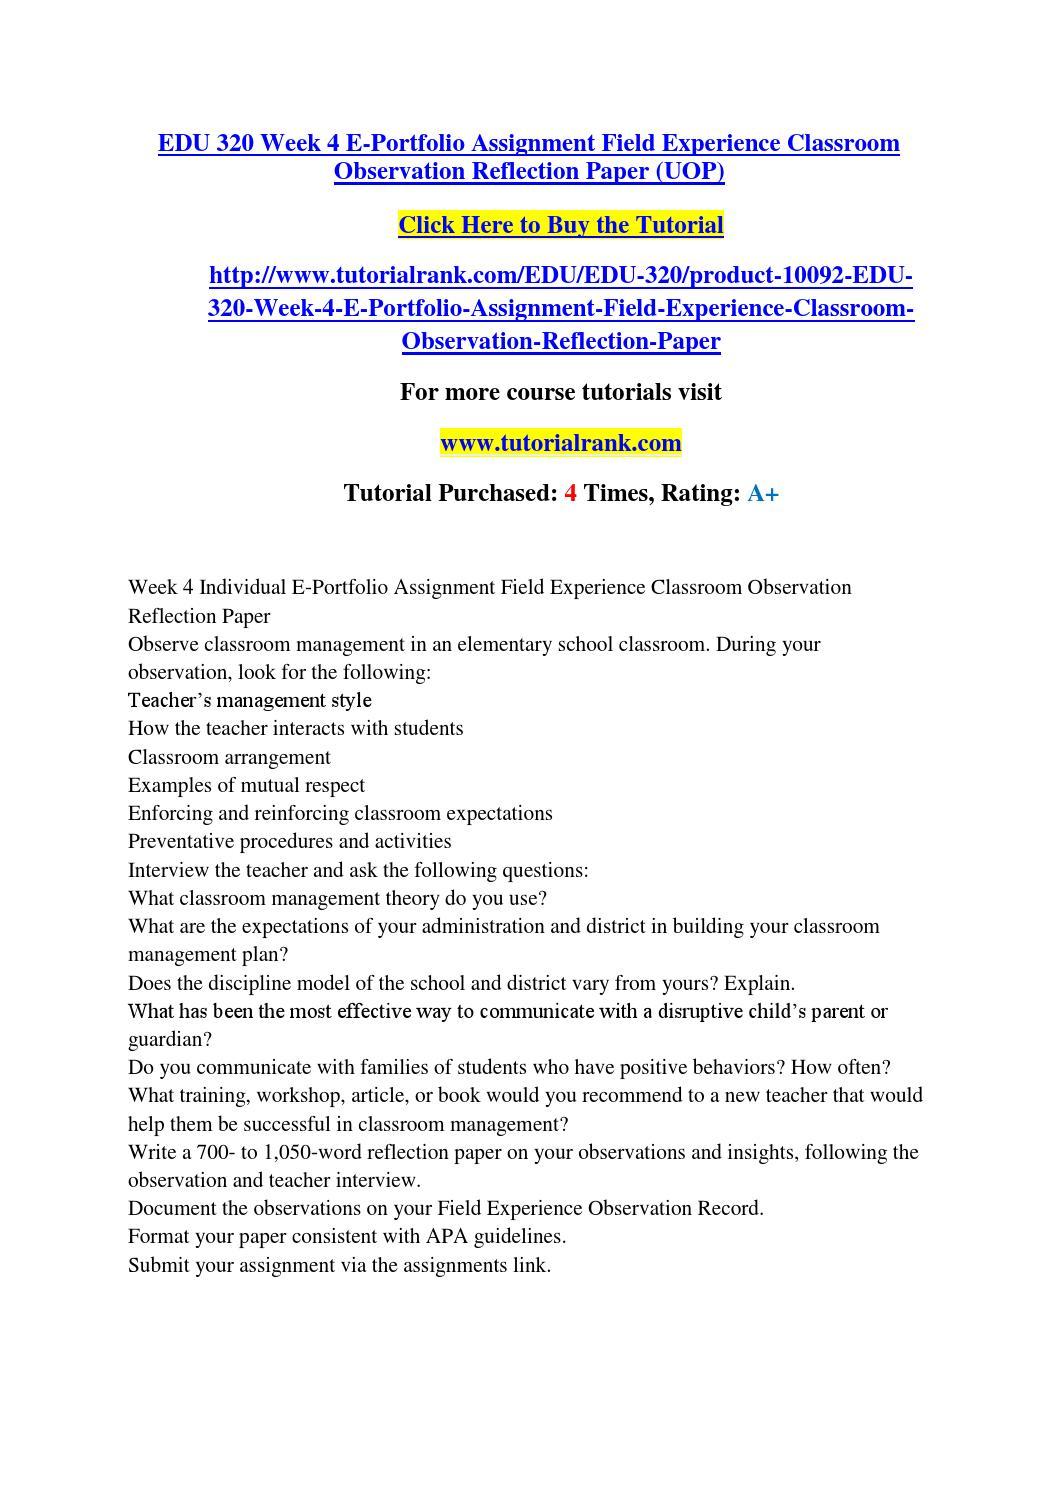 observation reflection paper